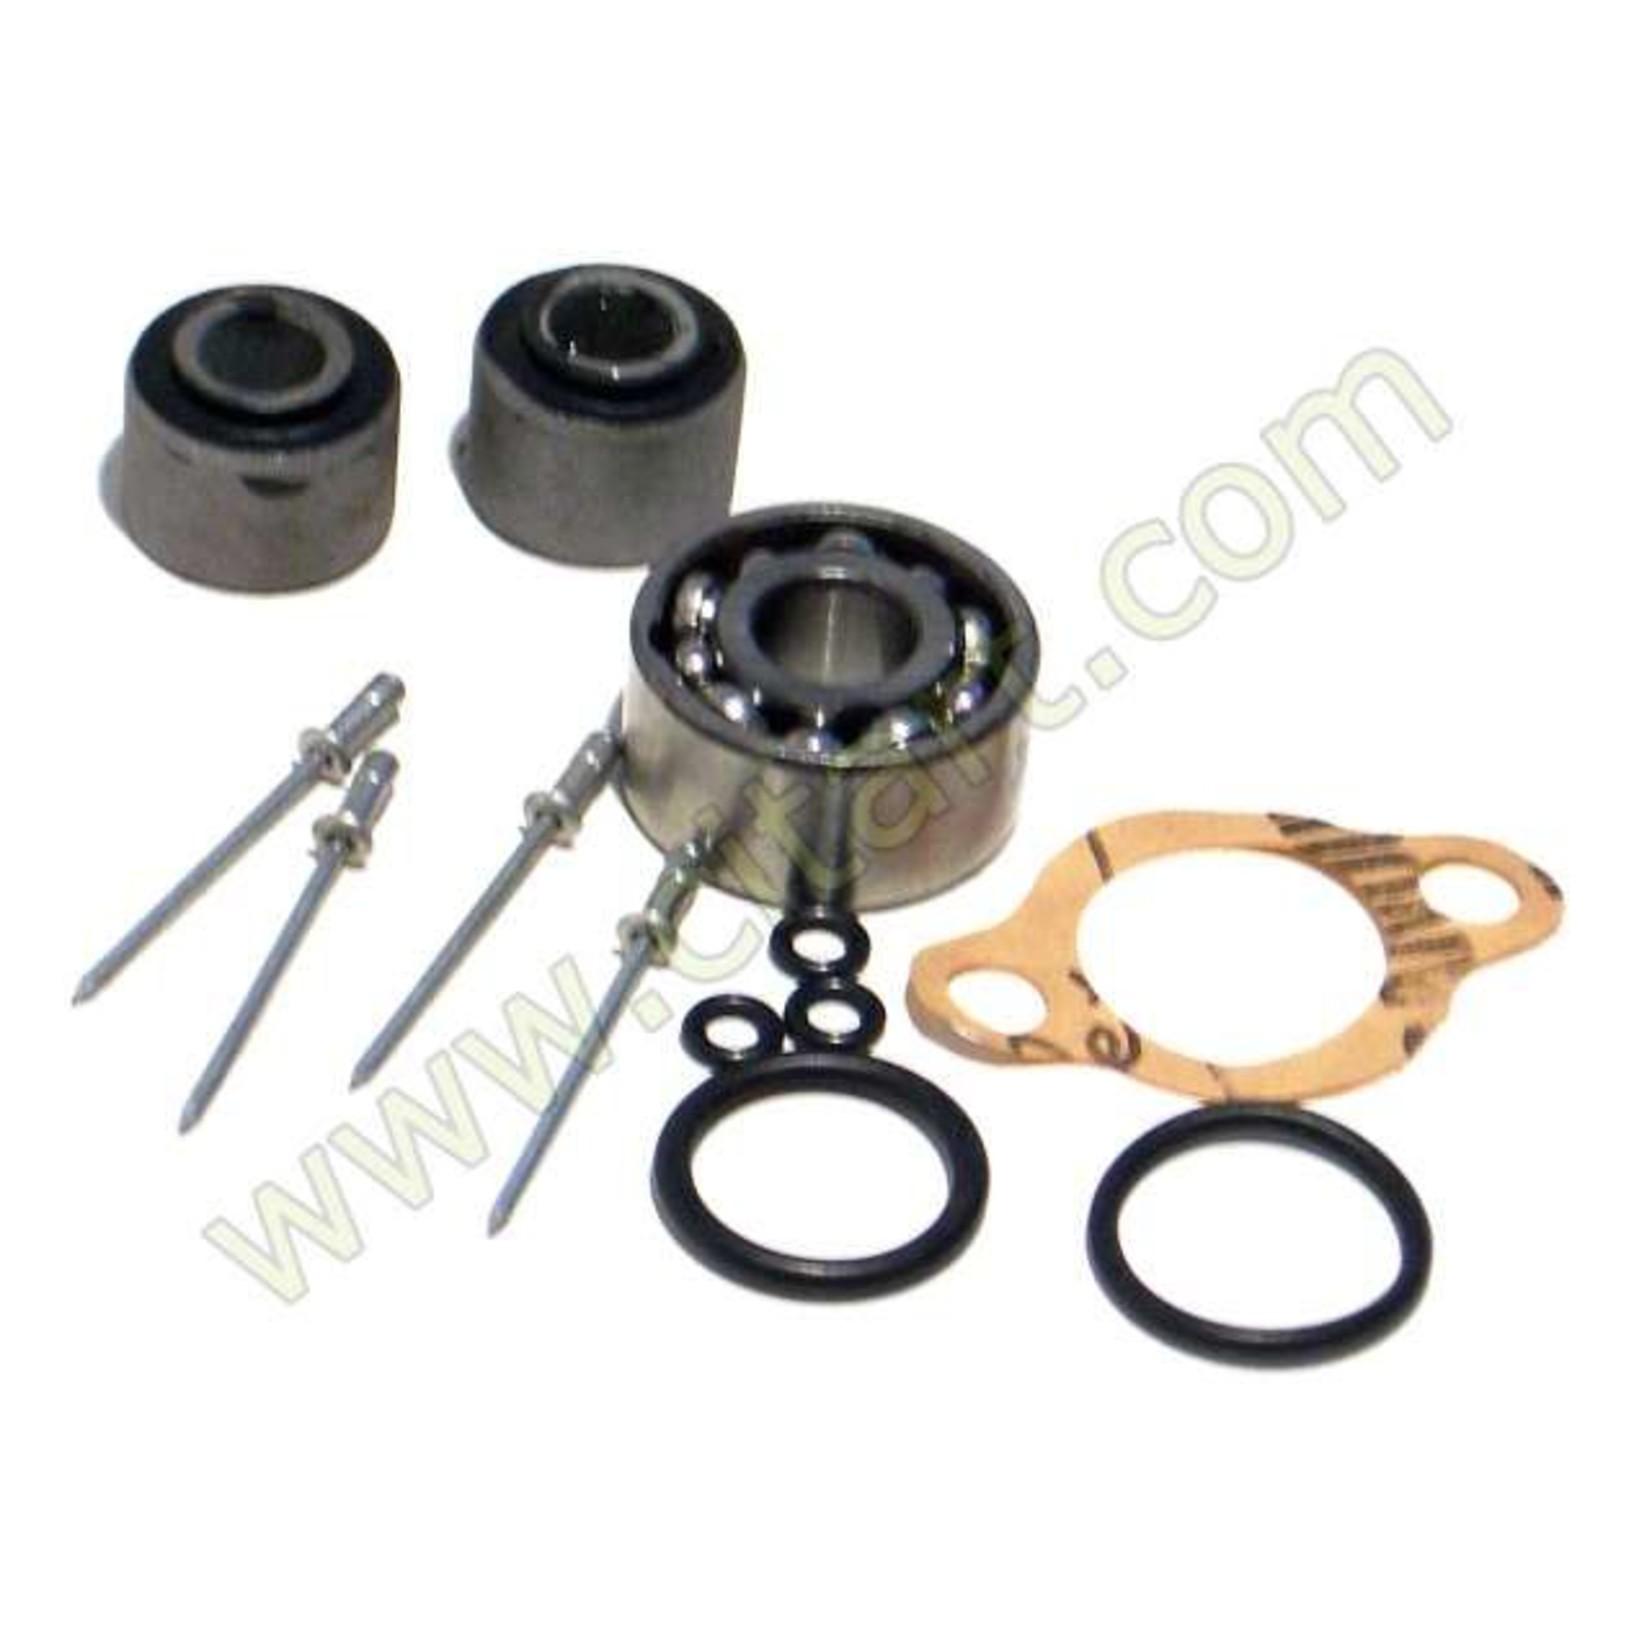 Revisieset centrifugaalregelaar Nr Org: ZC9000739U